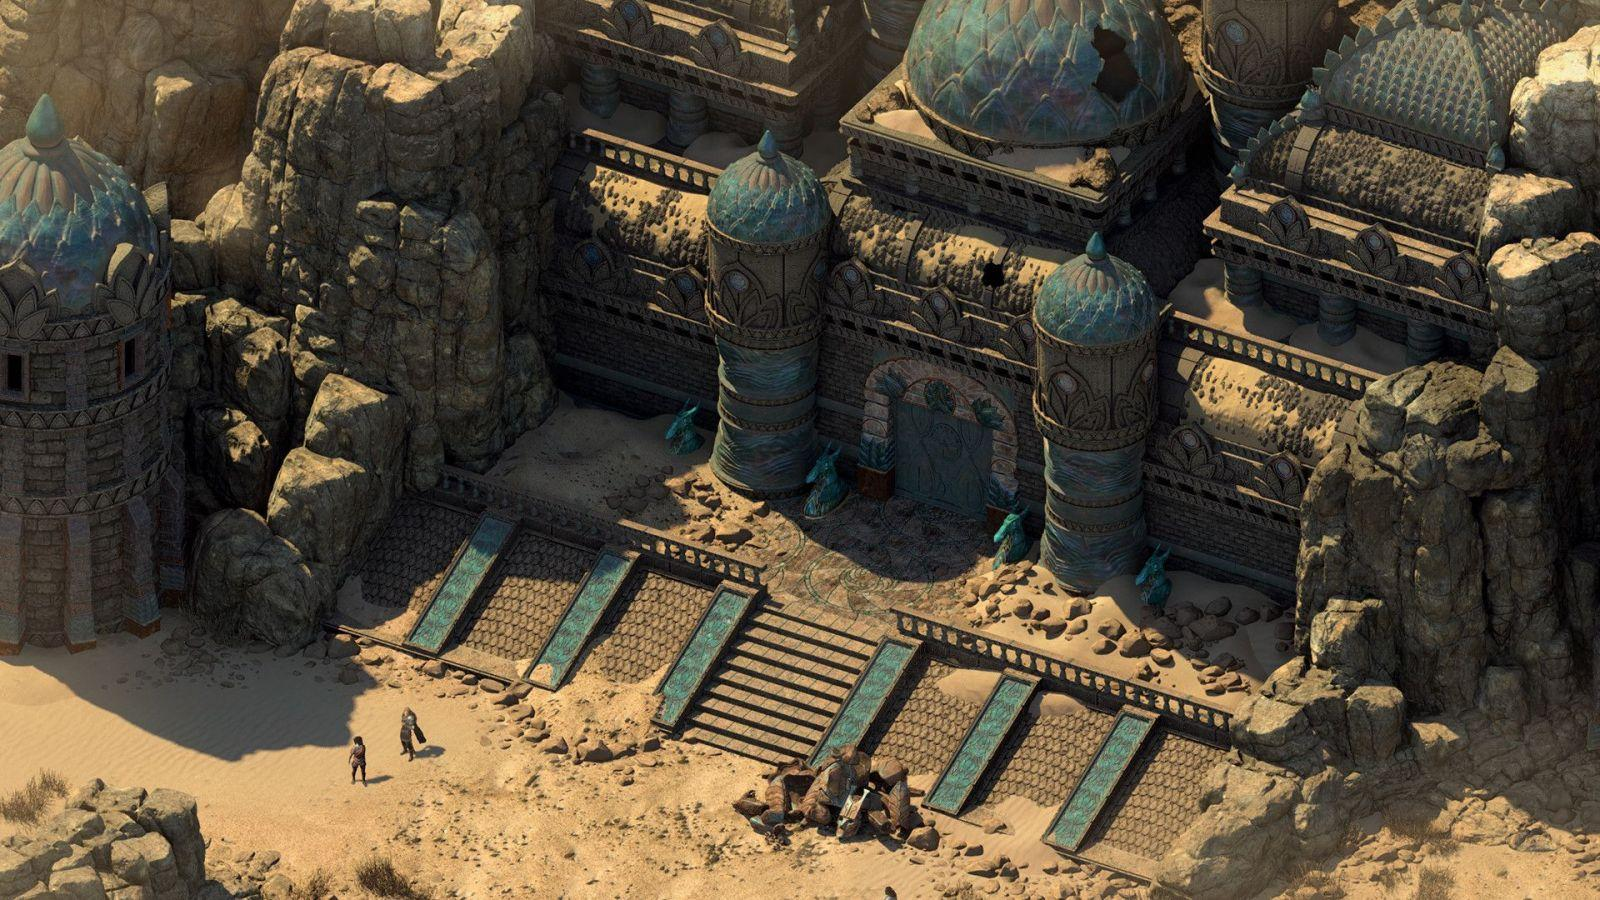 В GOG началась крупная акция со скидками на игры до 90% (7m6e3gknkr)